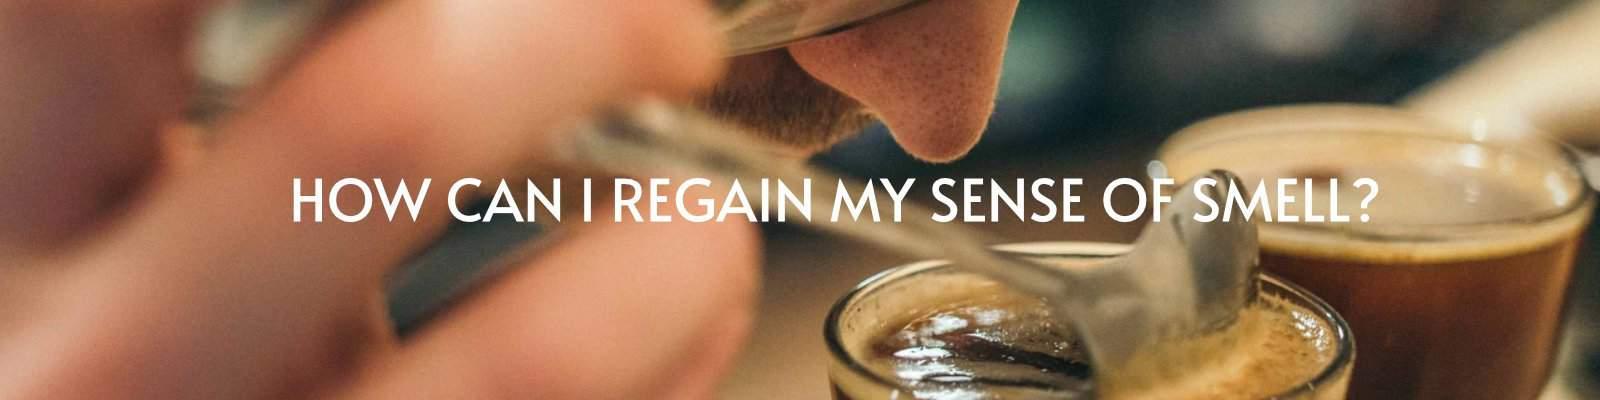 Reclaim-my-sense-of-smell